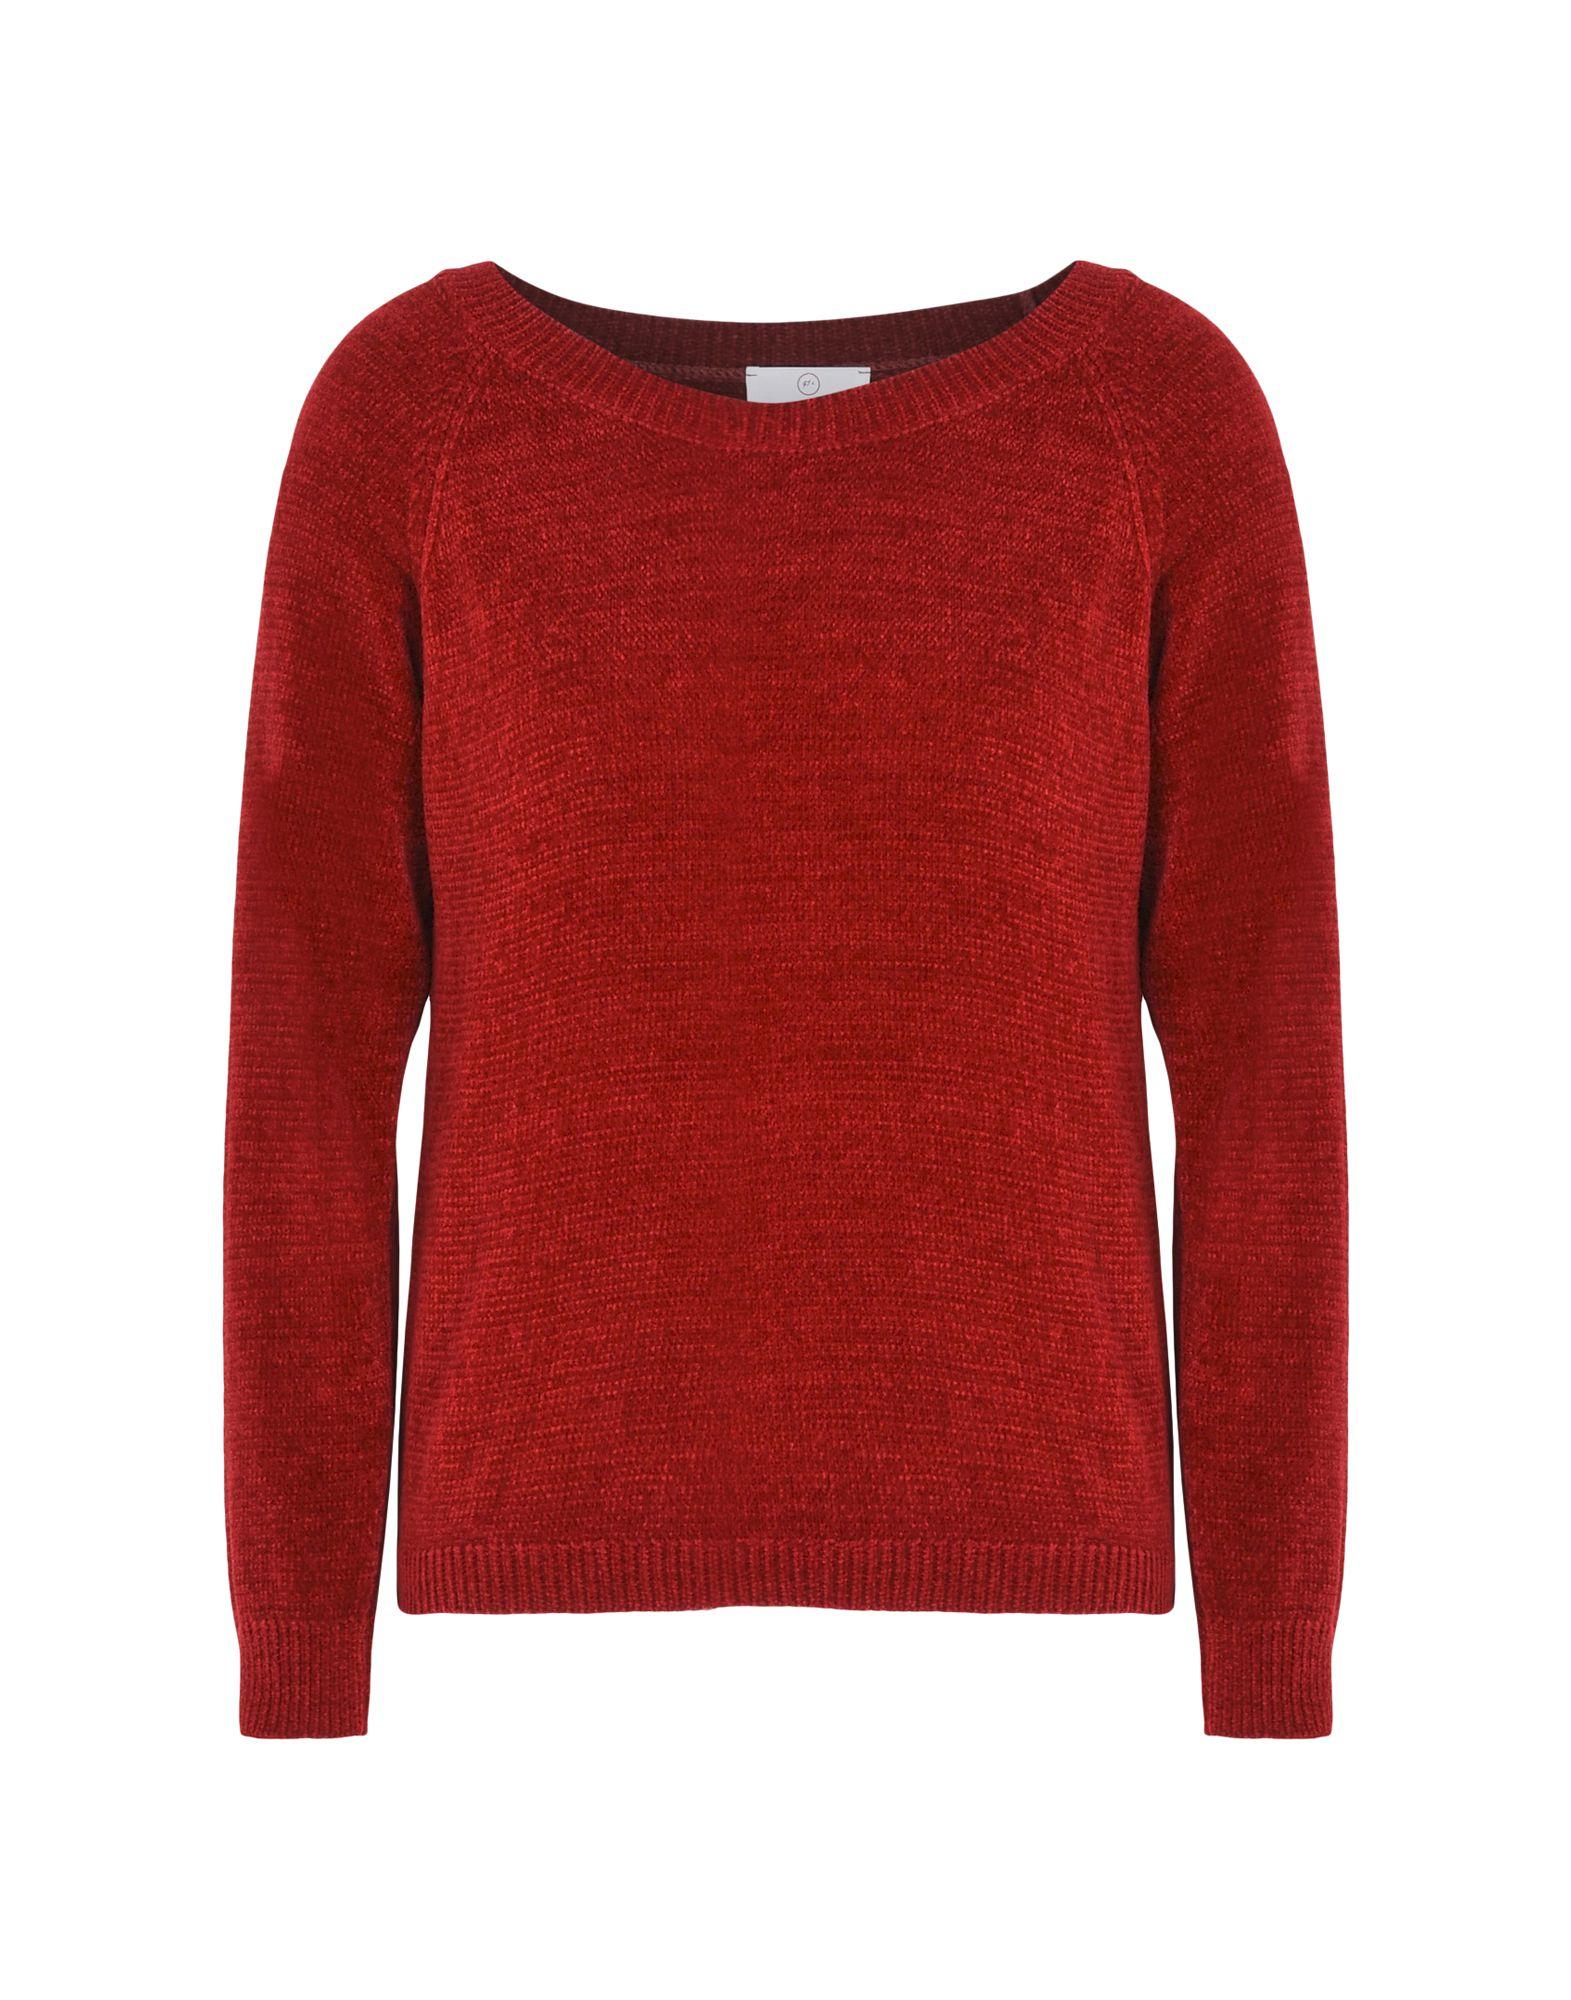 GEORGE J. LOVE | GEORGE J. LOVE Sweaters 39834316 | Goxip